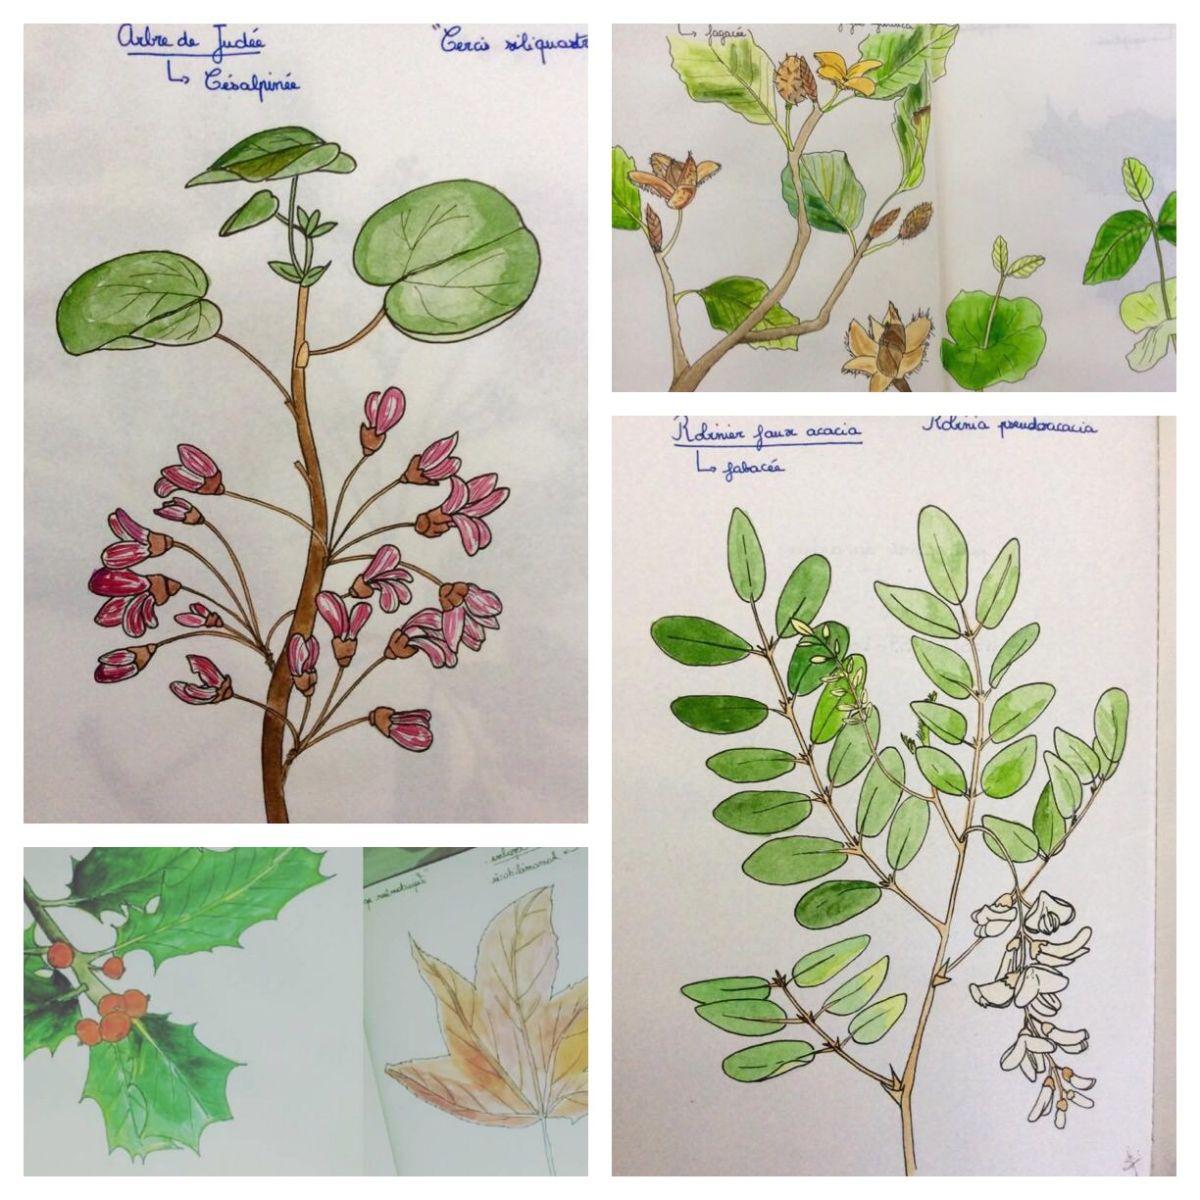 A Sketchy Herbarium - Doodlewashes by Salomé Blain